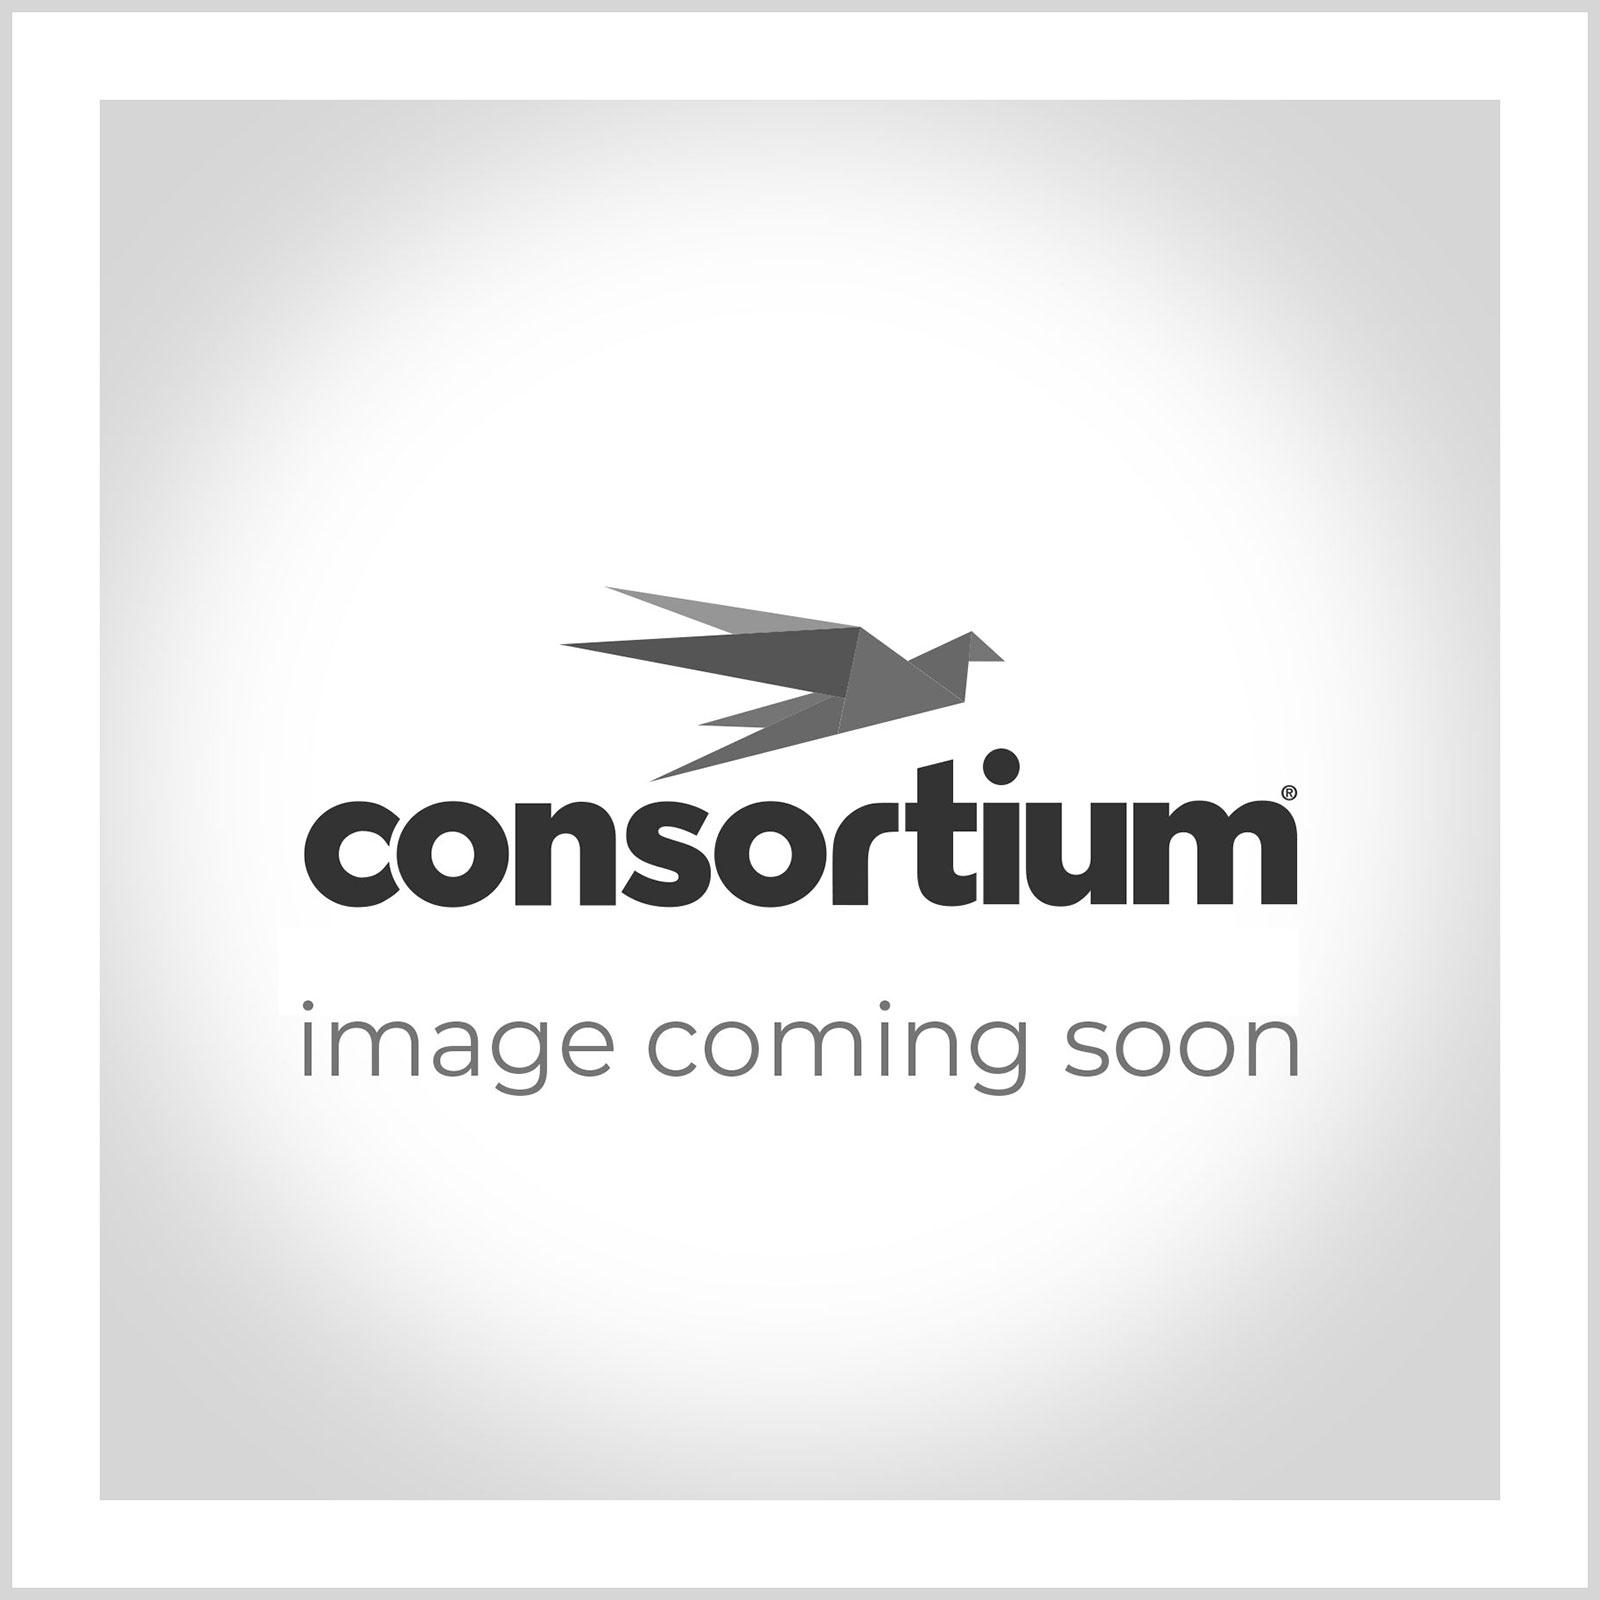 Cubby Tray Storage: 4 Tier with 8 Trays